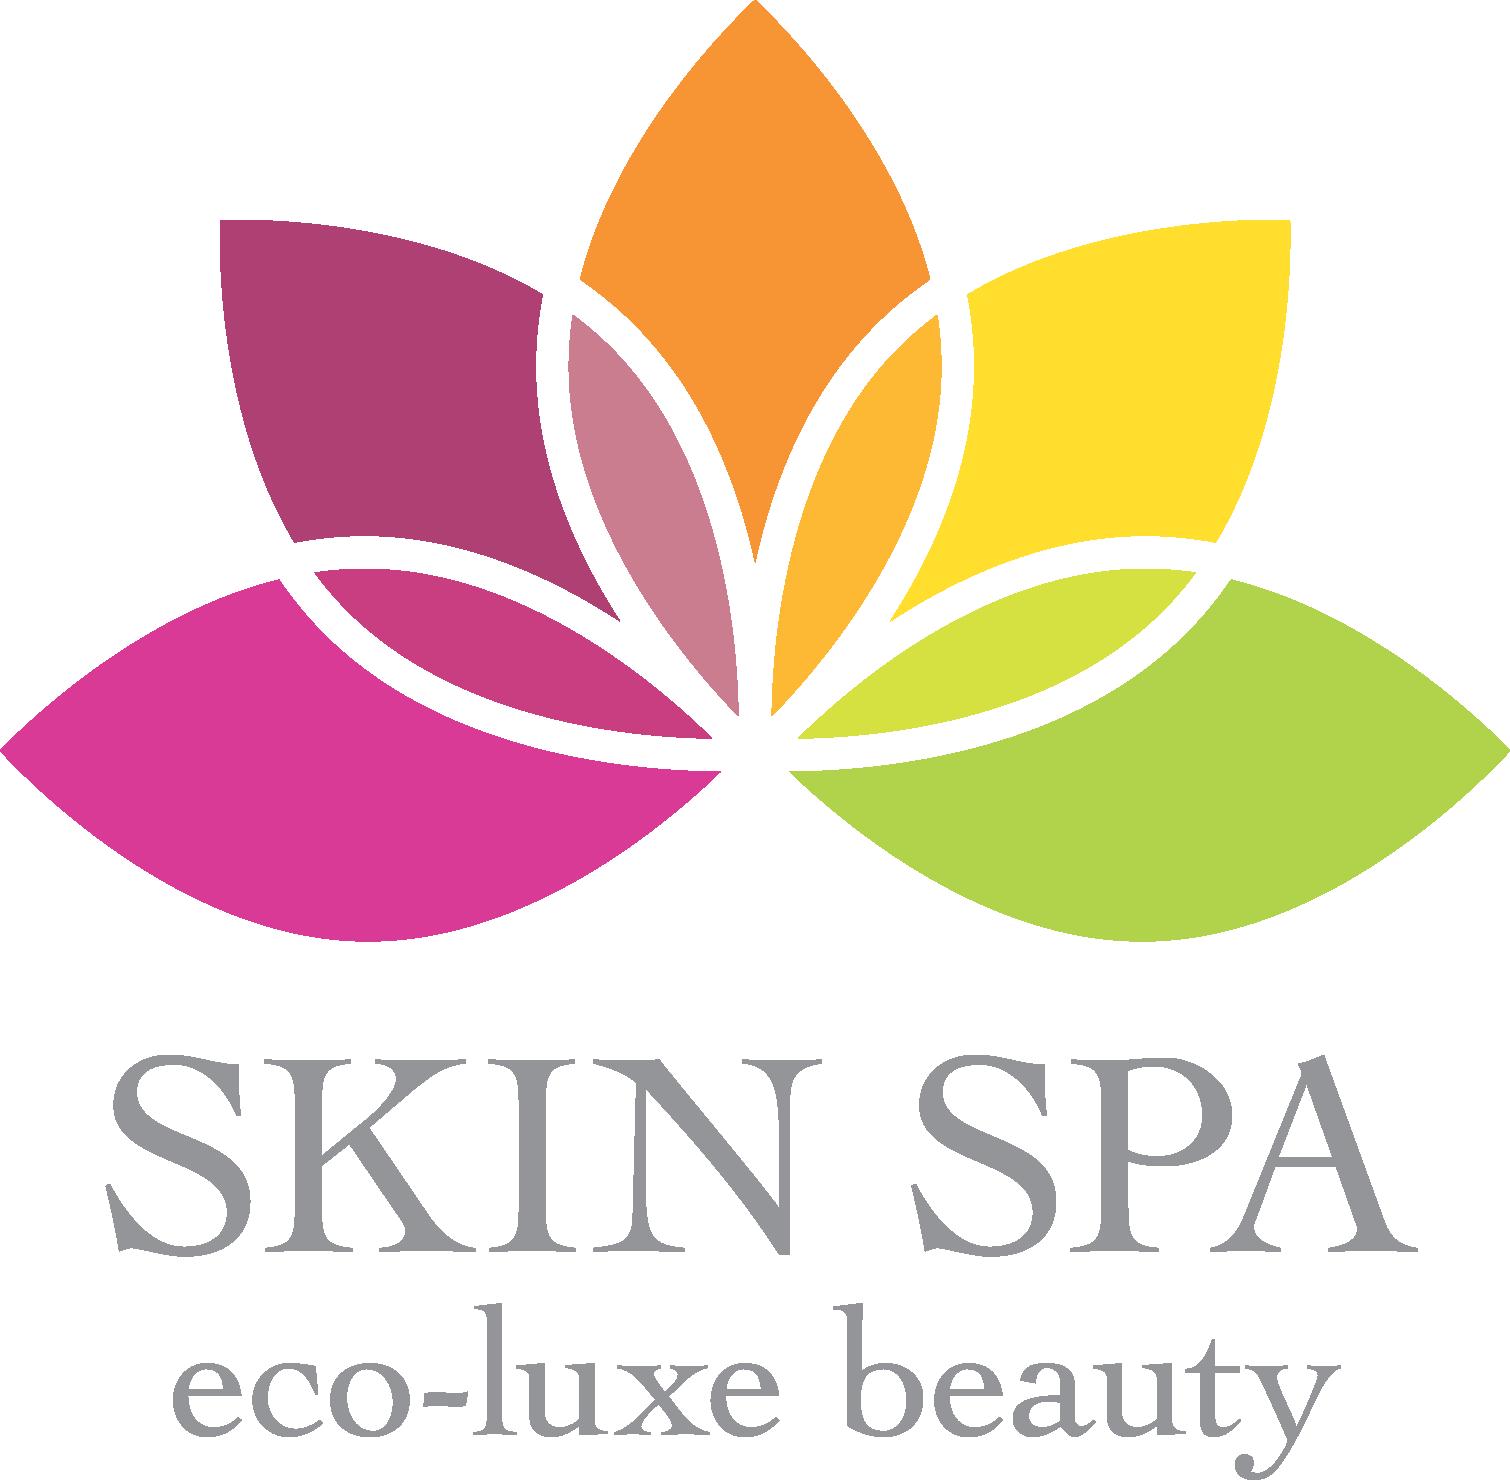 skin spa eco luxe beauty jacksonville beach